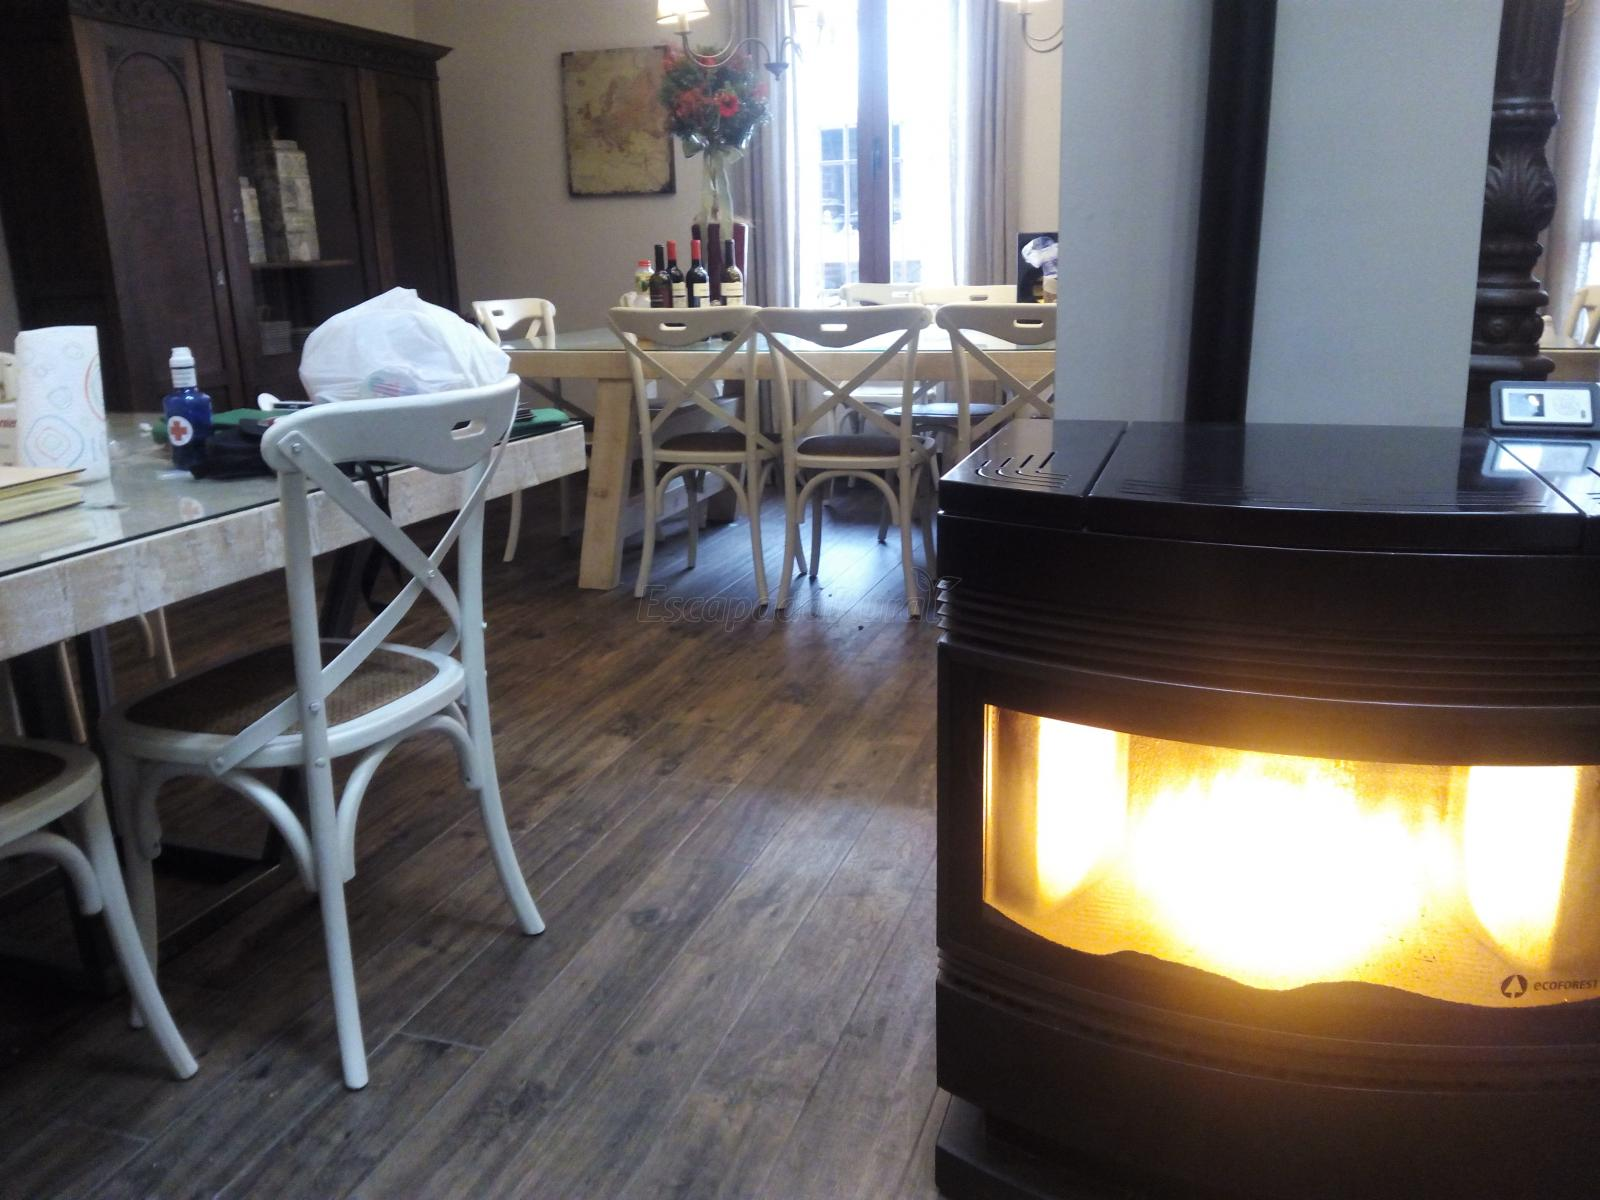 Opiniones sobre casa rural valle de la laguna madrid for Casa rural romantica madrid